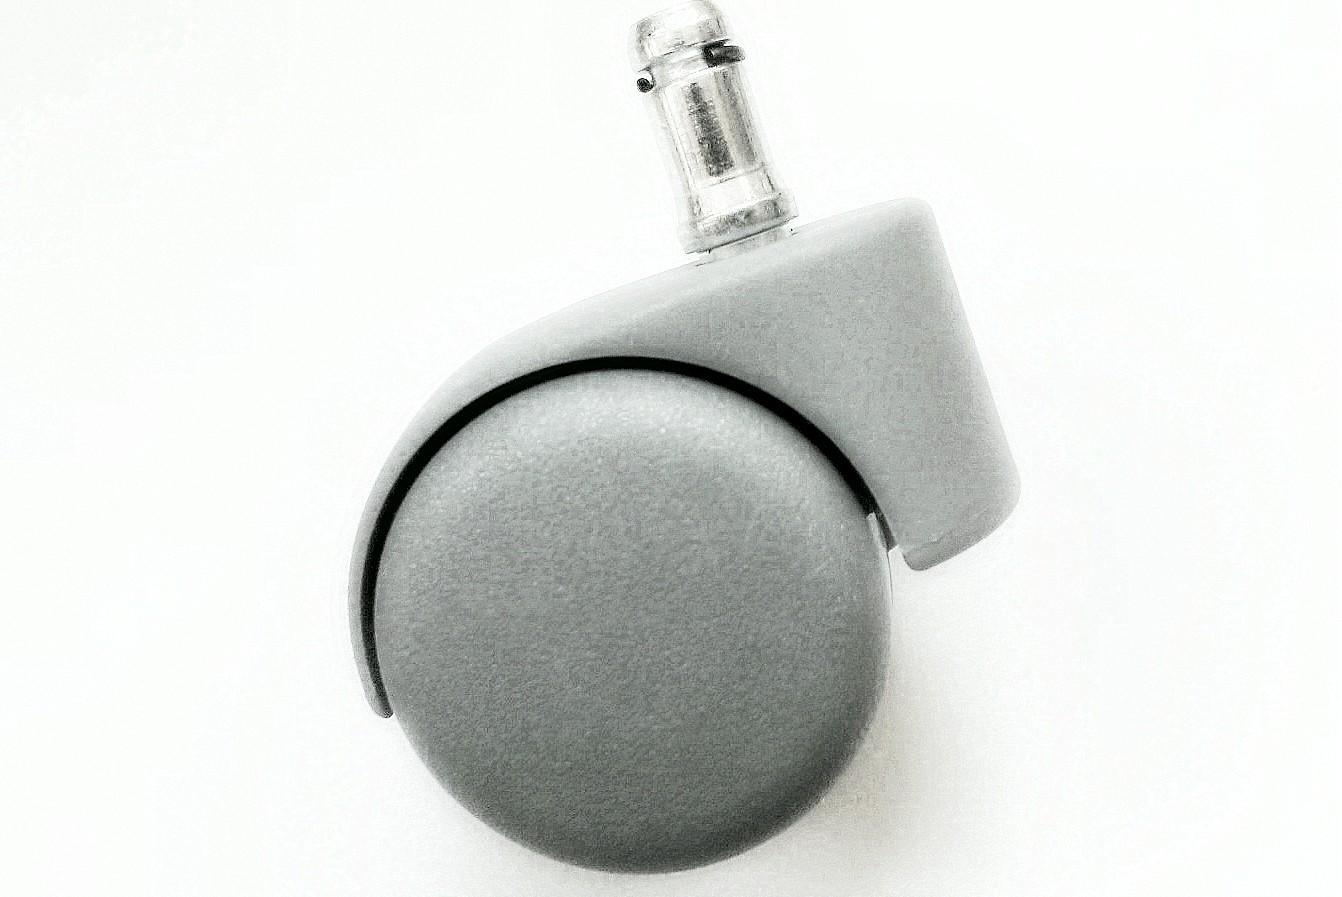 https://www.kancelarskezidle.com/images/shop/products/1045446/fullsize/main-1931.jpg